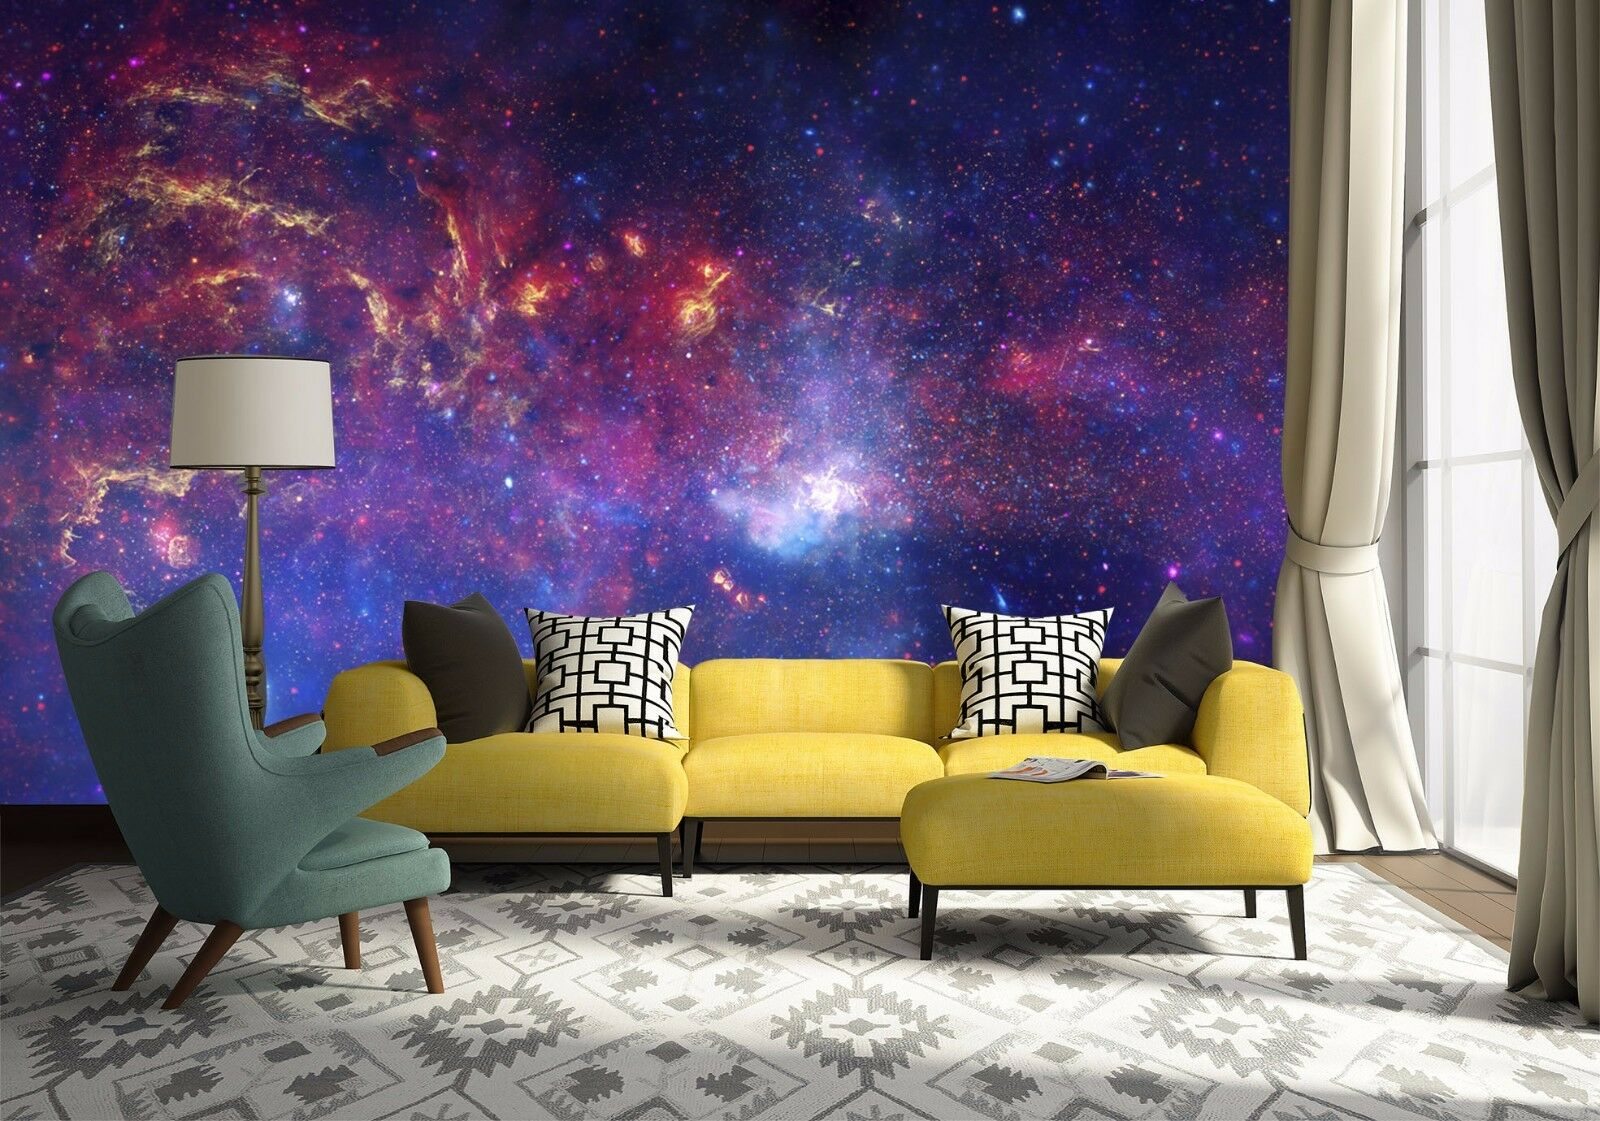 3D Stars Sky 432 Wallpaper Murals Wall Print Wallpaper Mural AJ WALL AU Kyra